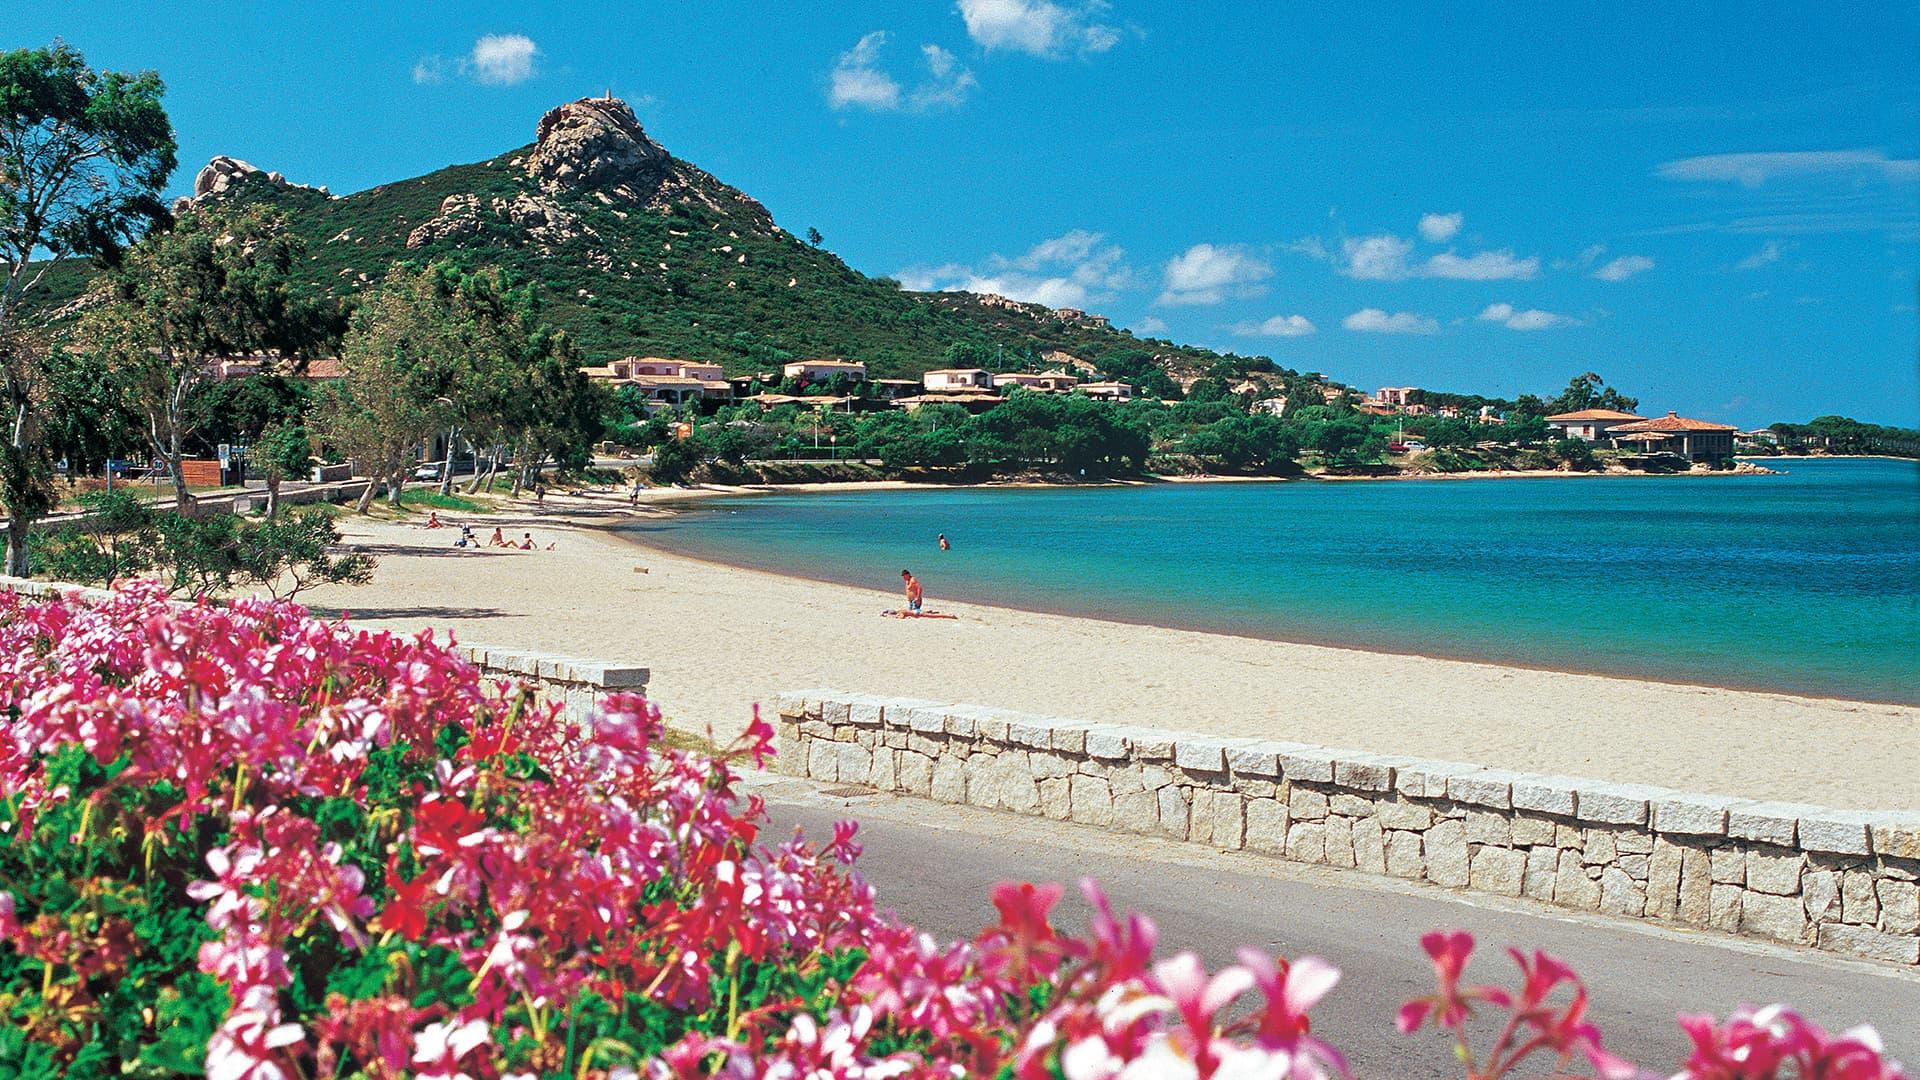 cala-falco-spiaggia-5-960